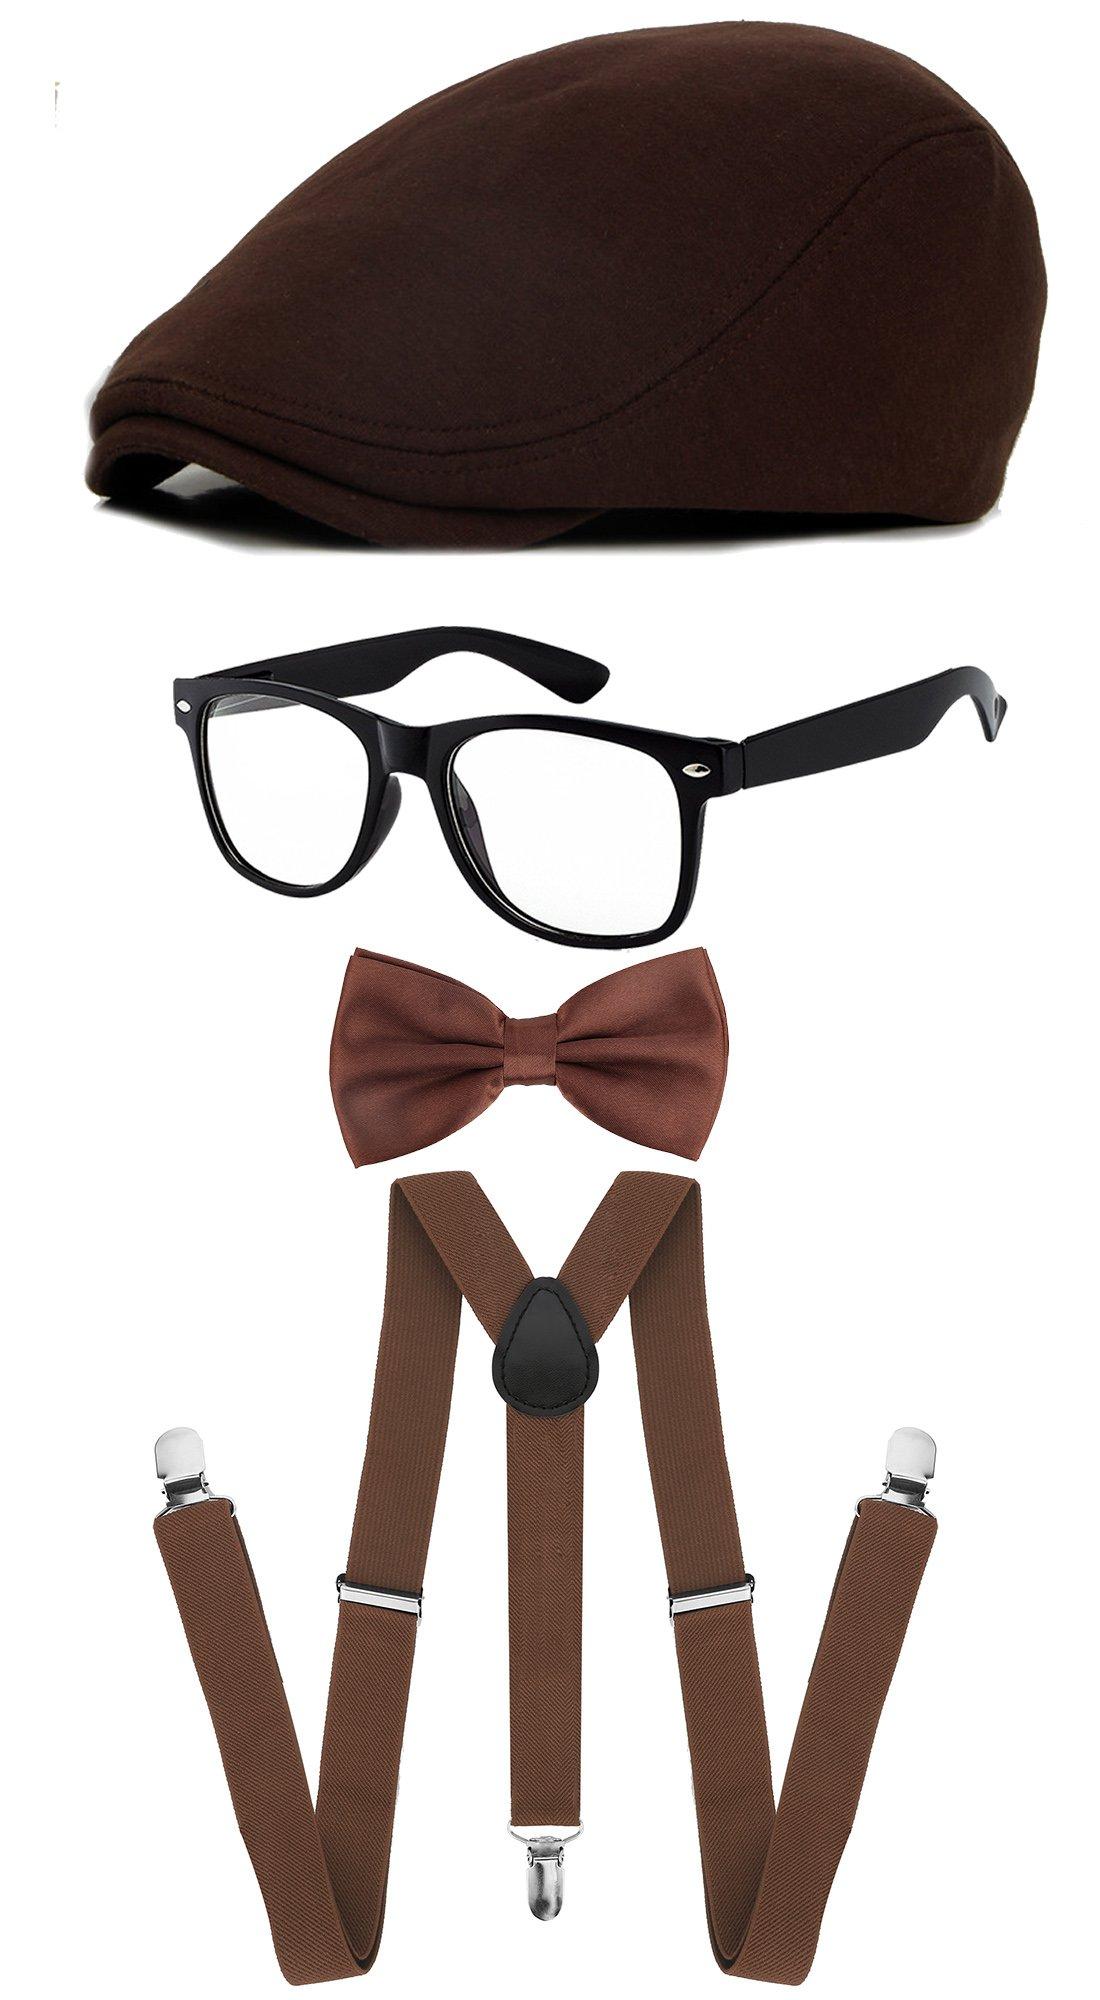 Classic Gatsby Newsboy Ivy Hat,Suspenders Y-Back Trouser Braces,Pre Tied Bow Tie,Non Prescription Glasses (Cotton - Coffee)